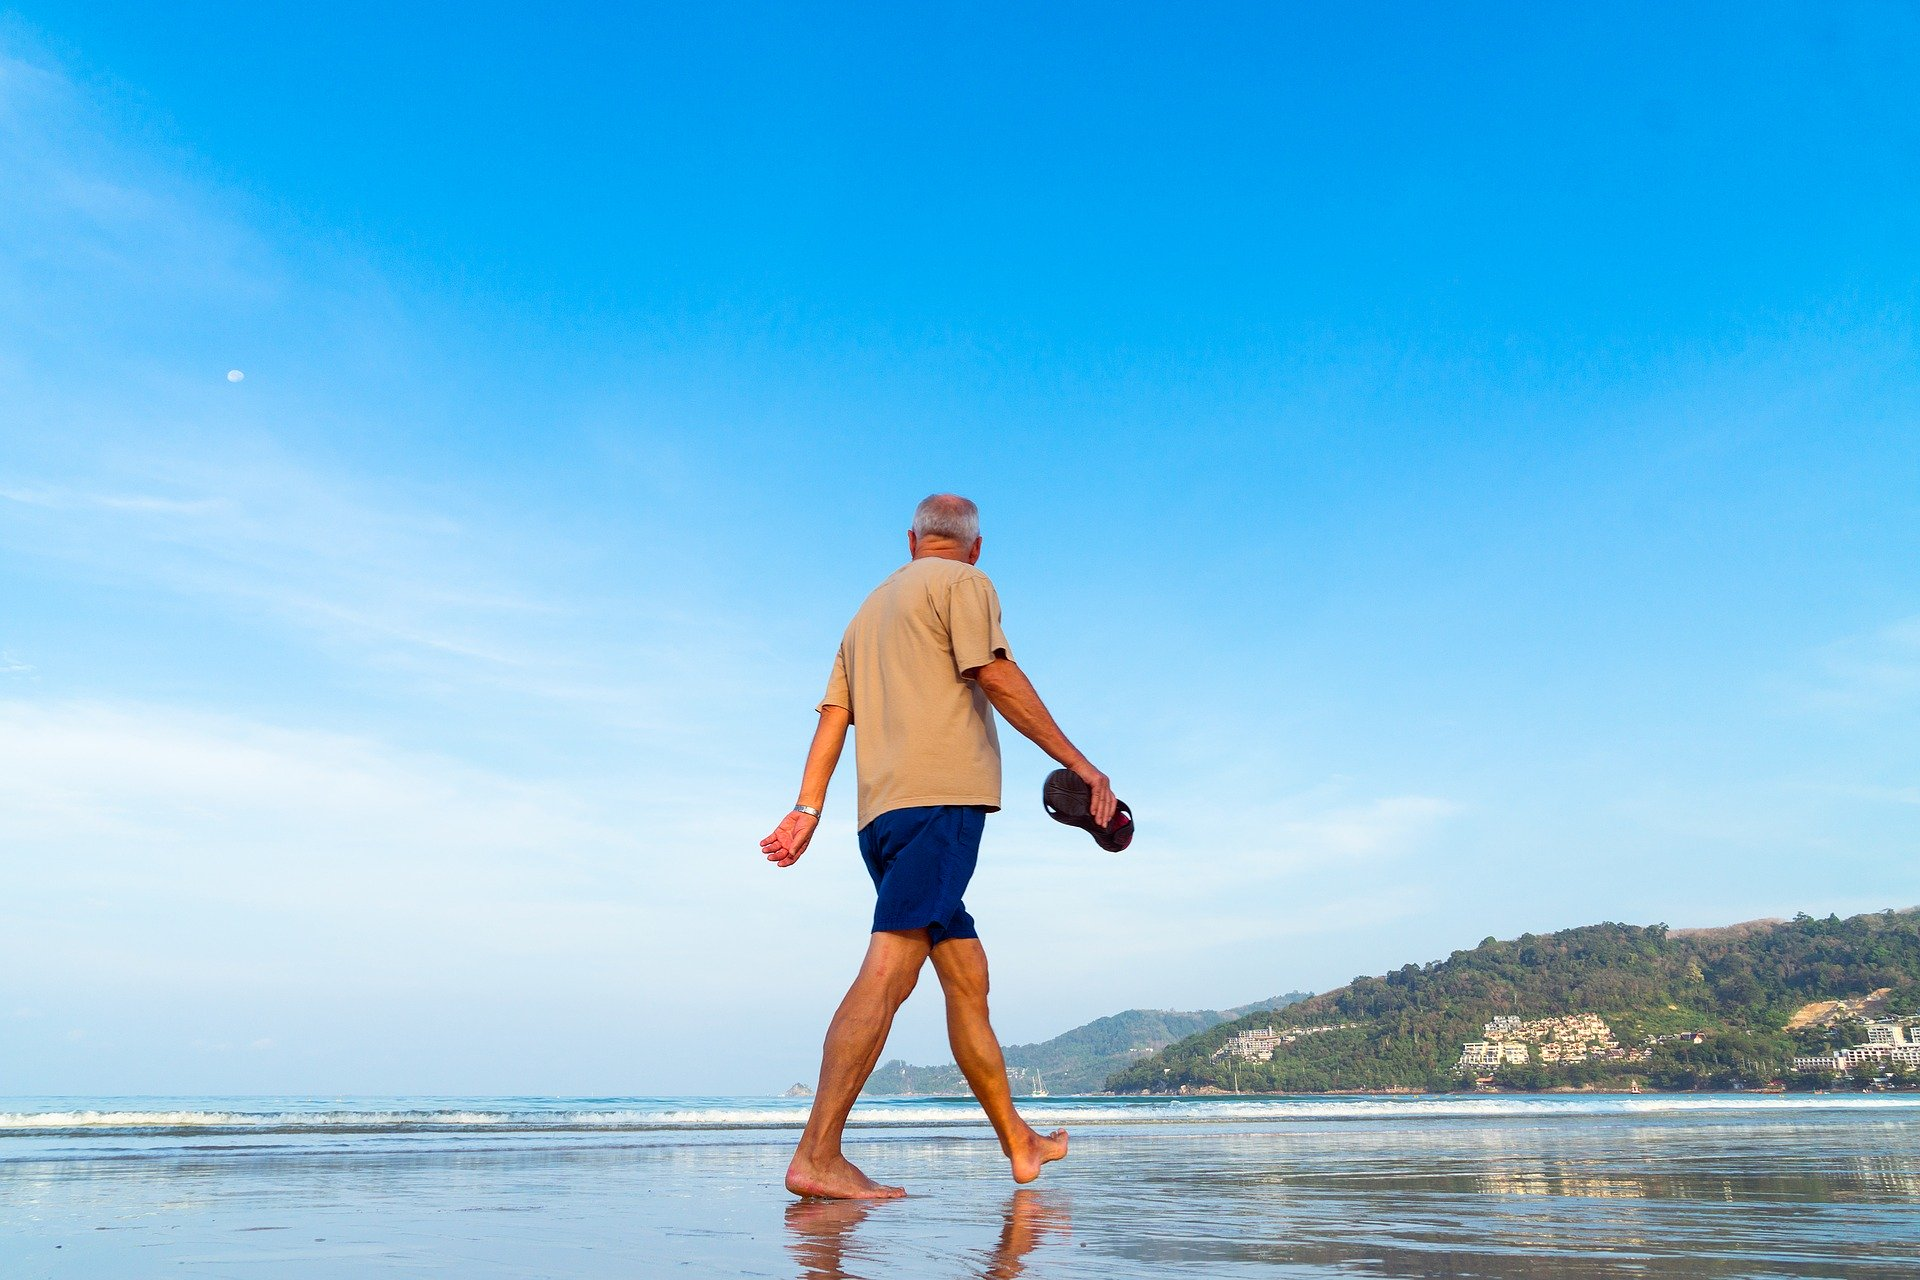 senior citizens insurance policy